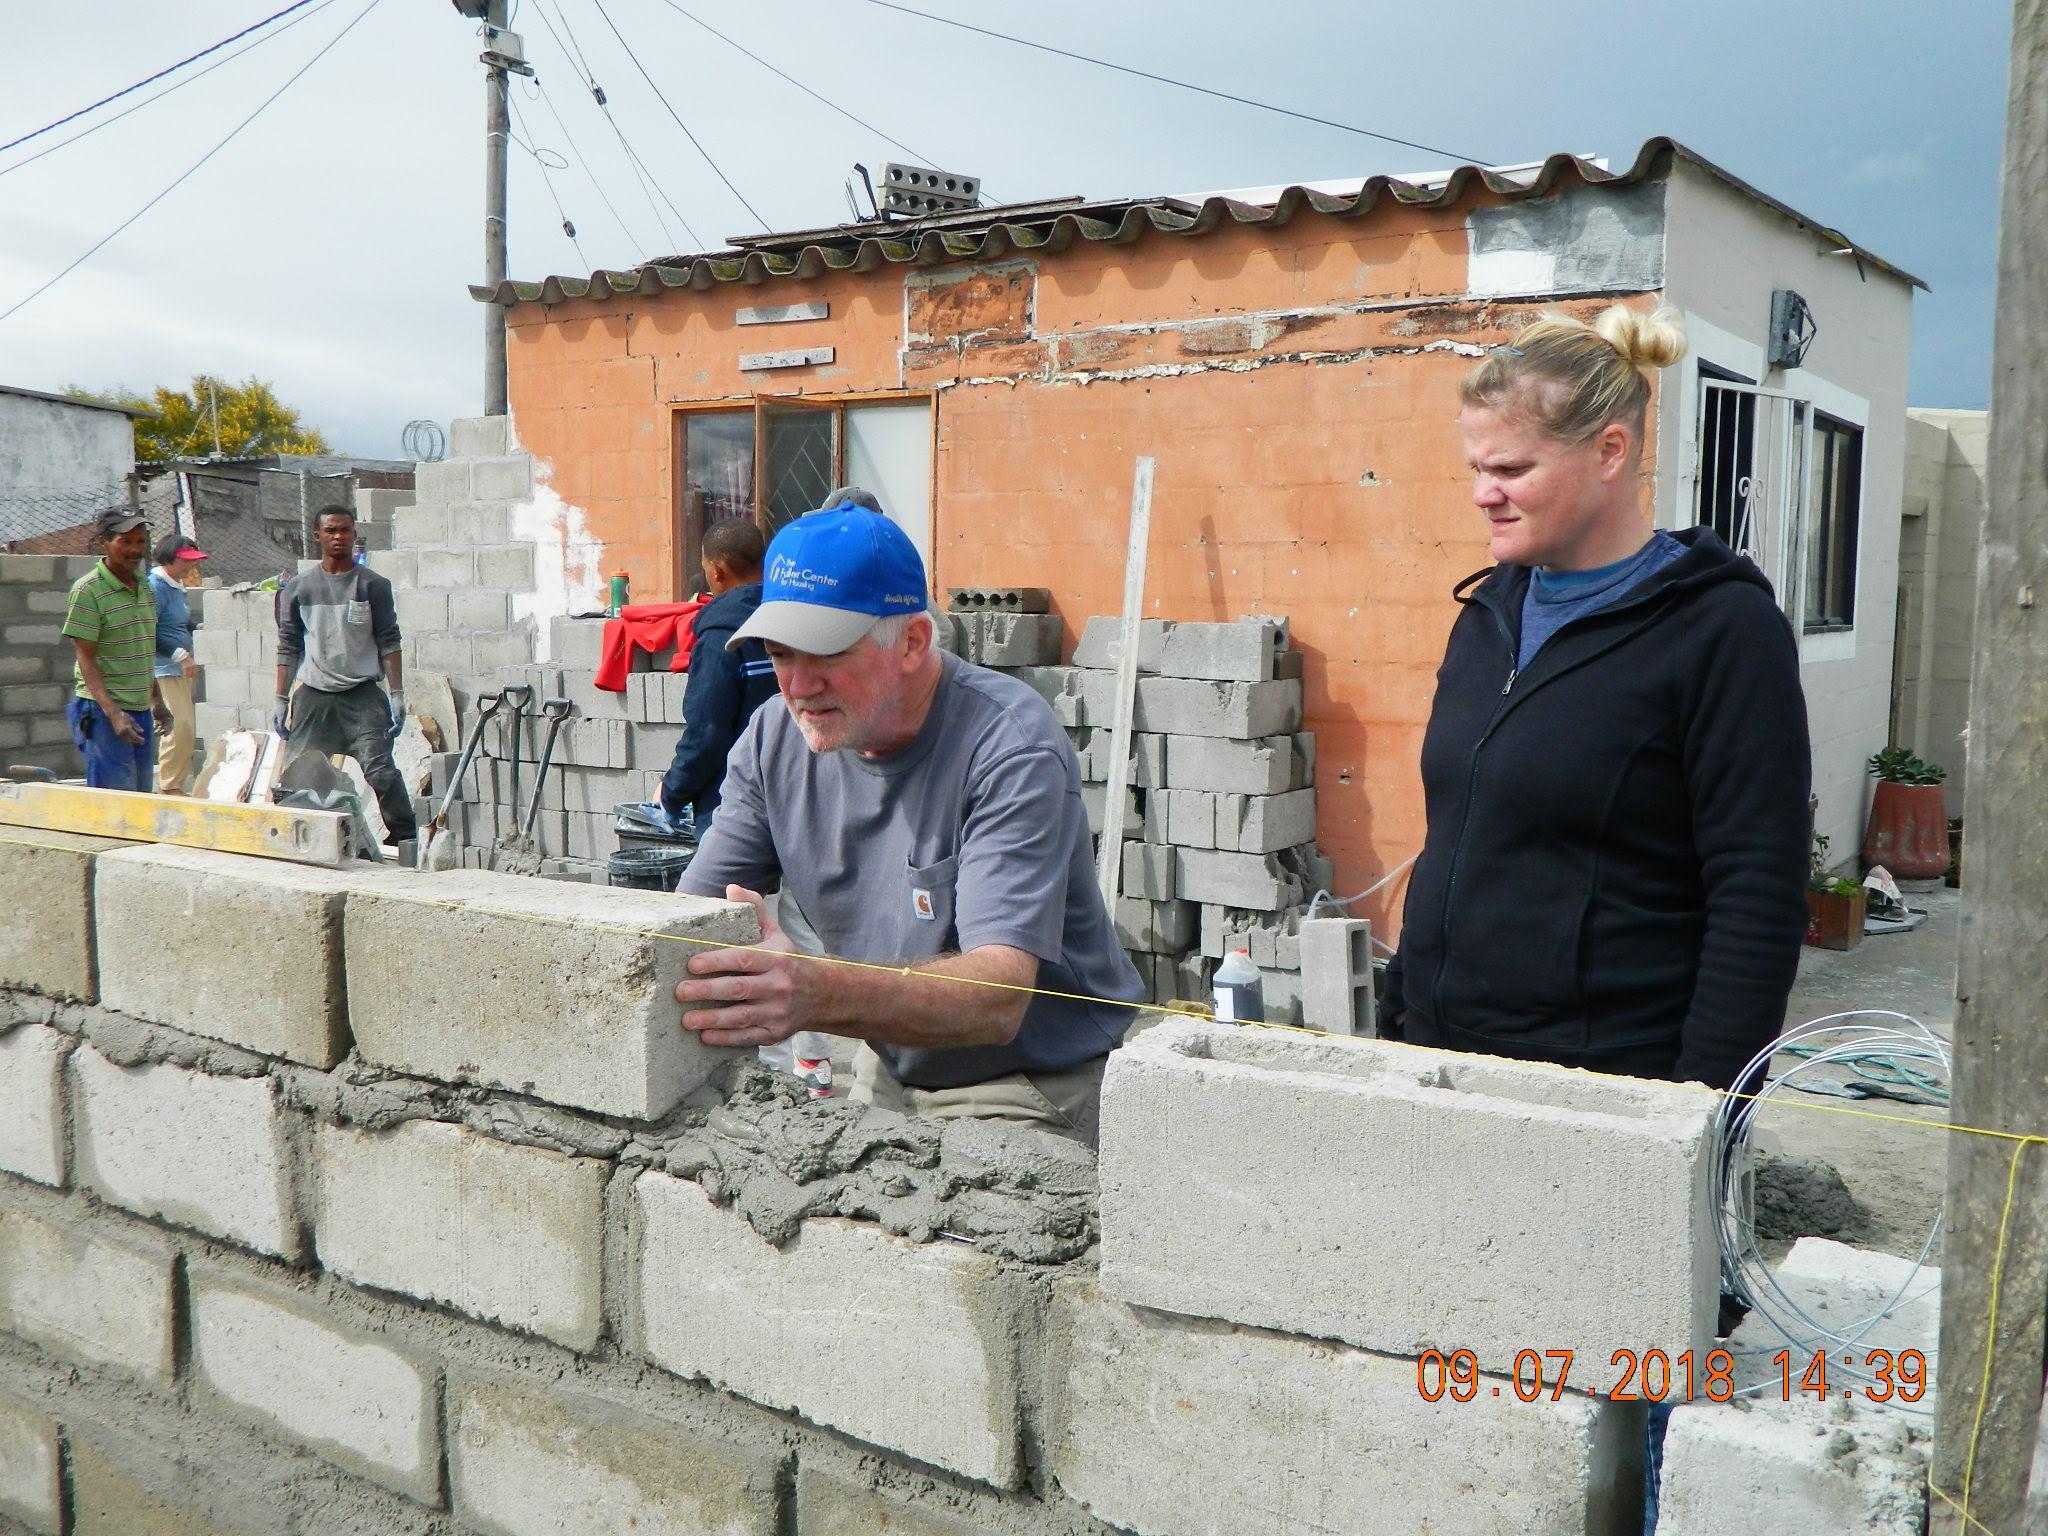 Bob lays bricks while Beth learns